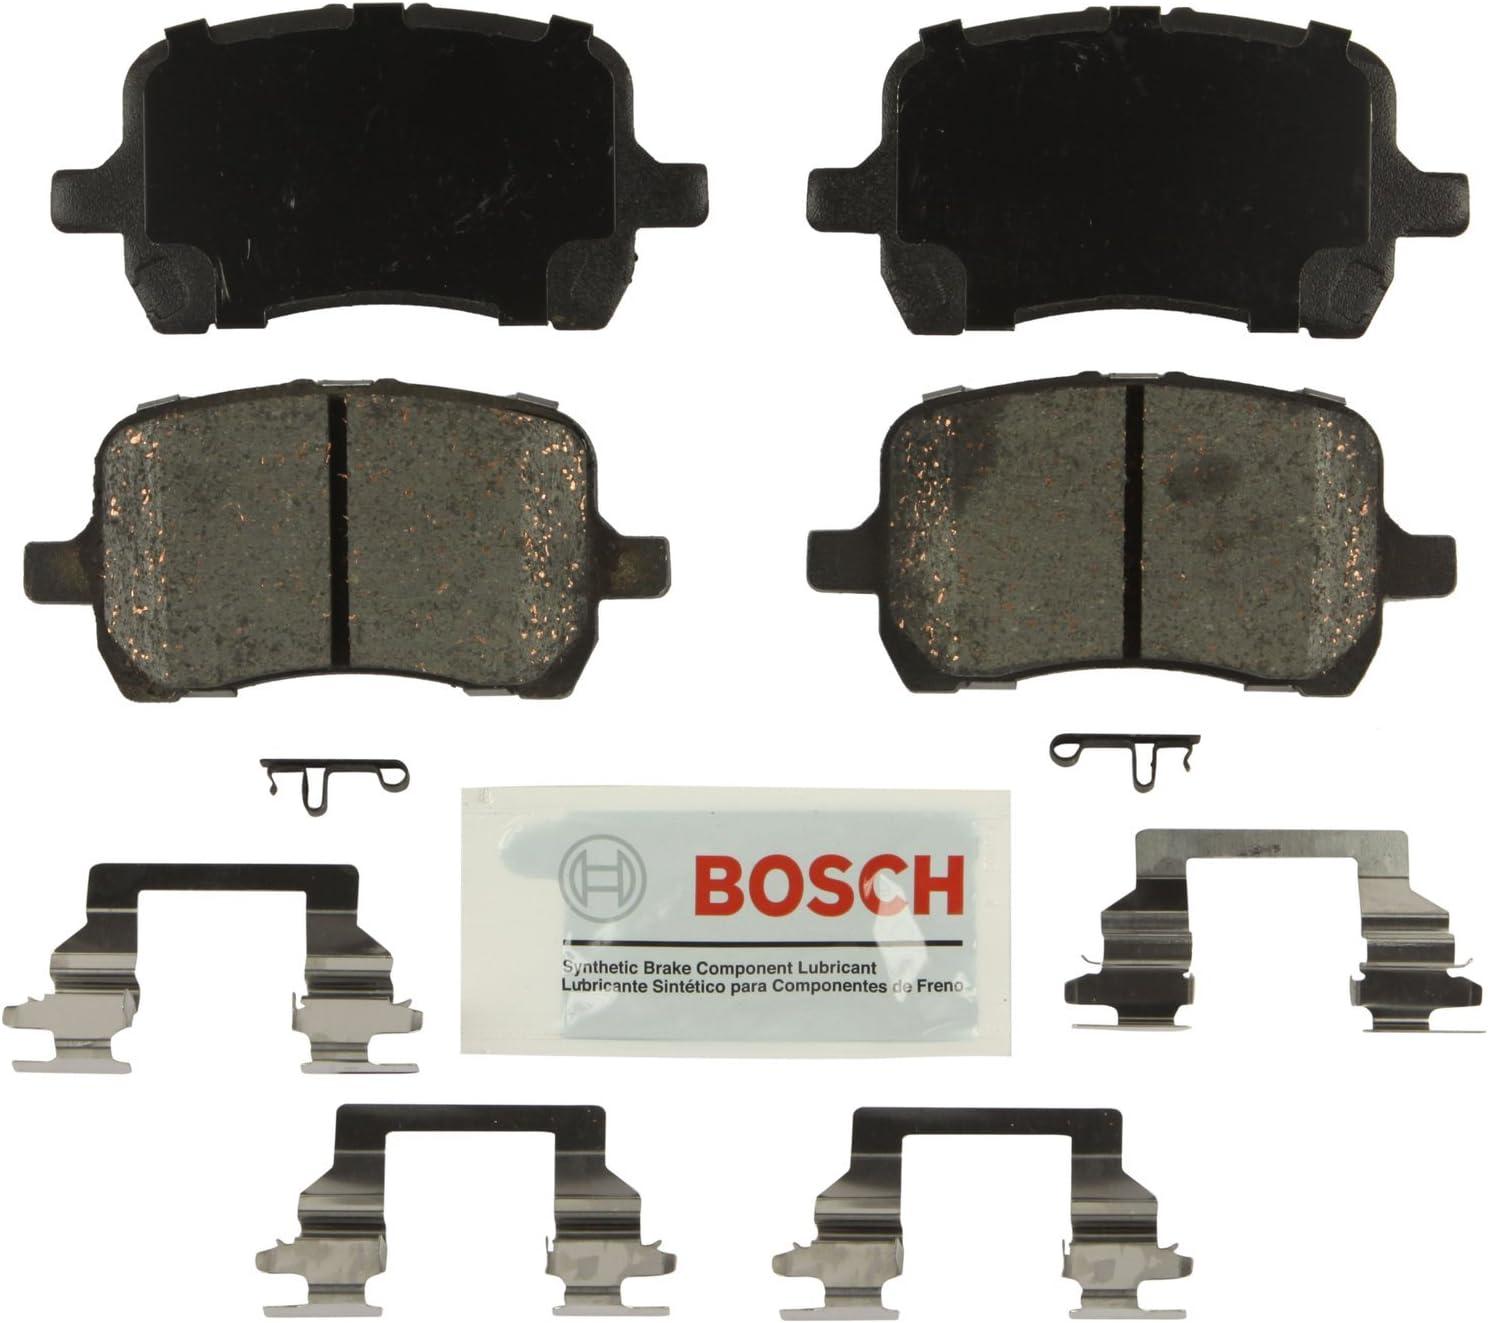 Bosch BE1160H Blue Disc Brake Pad Set with Hardware for Select Chevrolet Cobalt HHR Malibu; Pontiac G5 FRONT G6; and Saturn Aura Vehicles